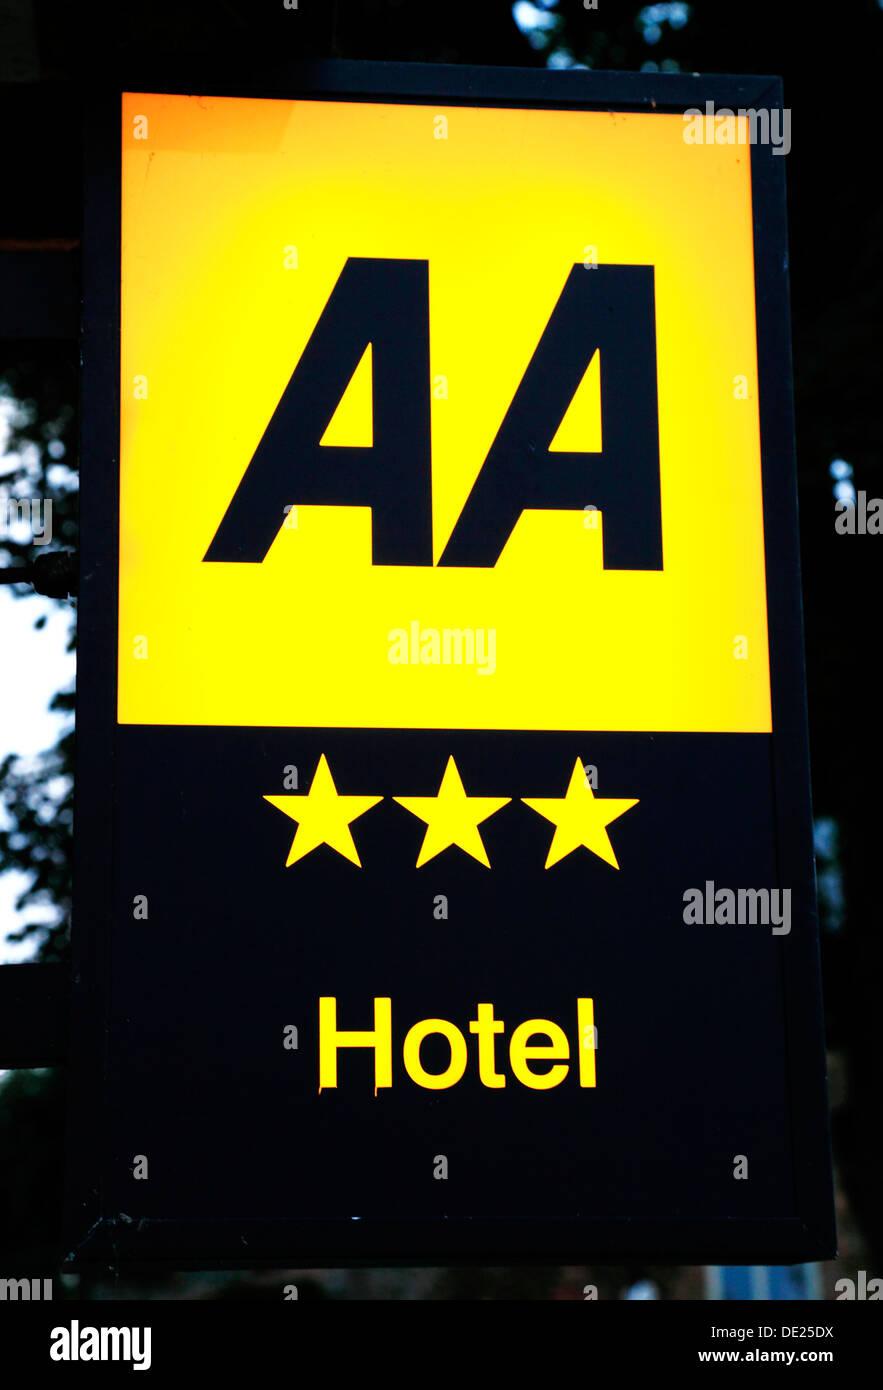 AA 3 Sterne, Sterne Hotel Zeichen Rating UK Stockbild